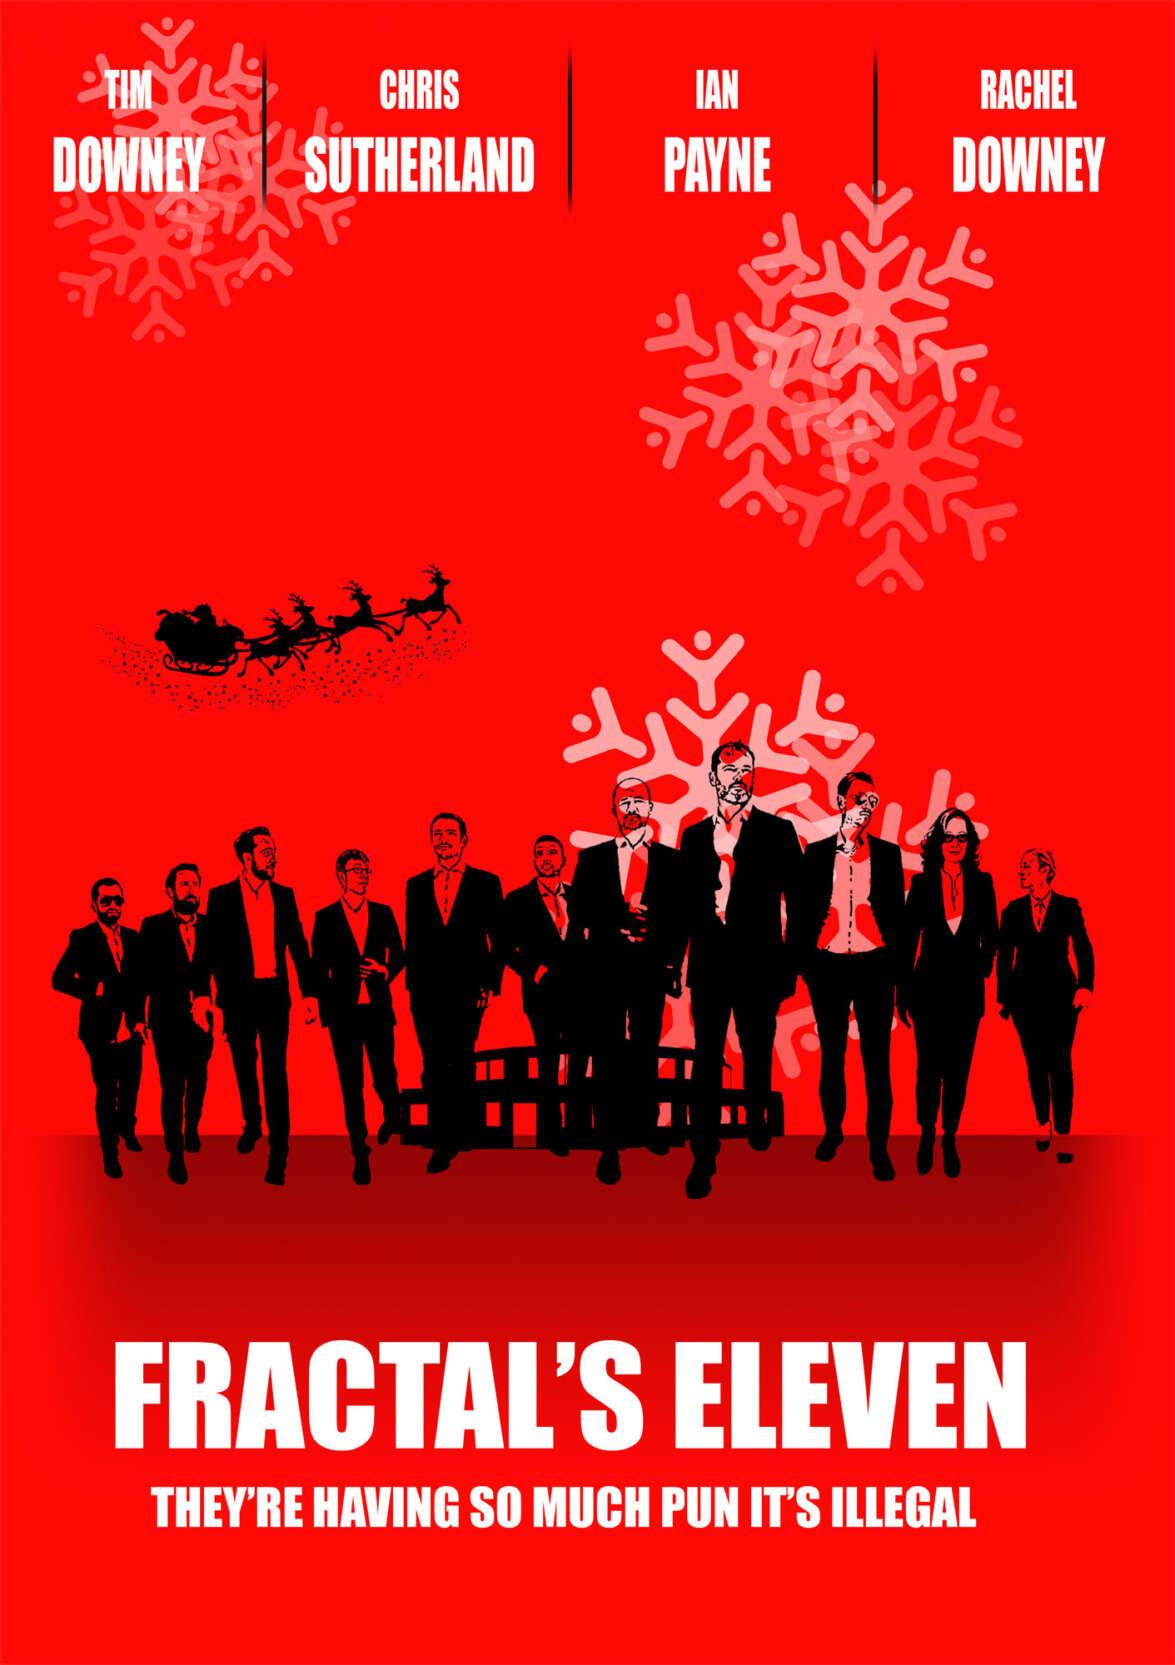 A Christmas heist by the StudioFractal team